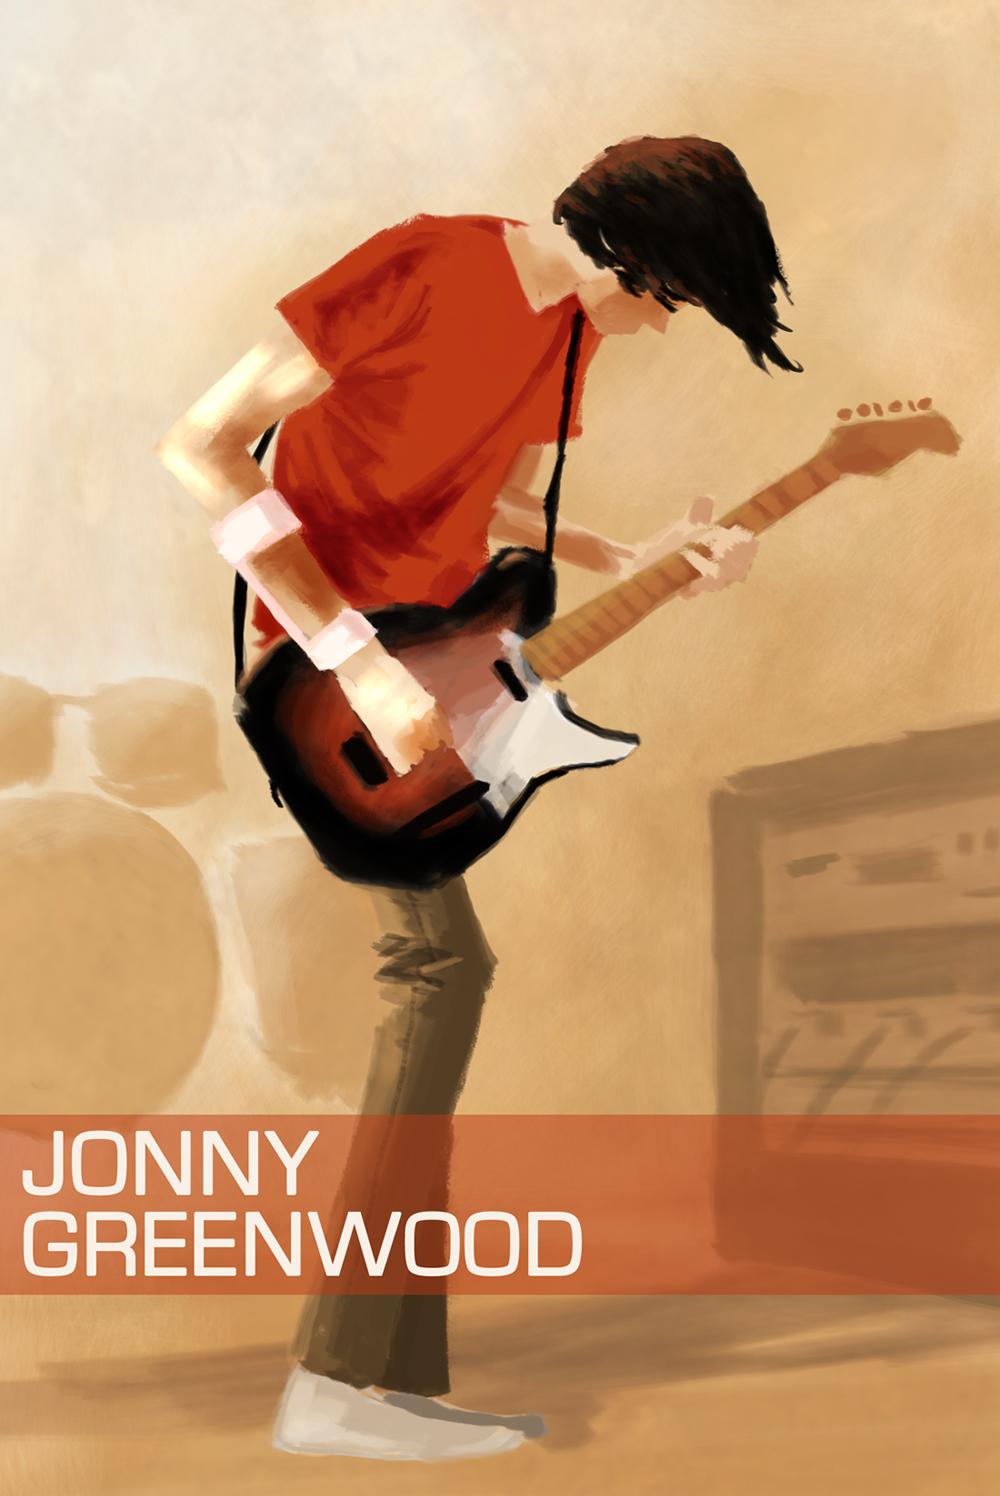 [Fotos] Jonny Greenwood - Página 6 Jonny_greenwood_by_kupi_ae